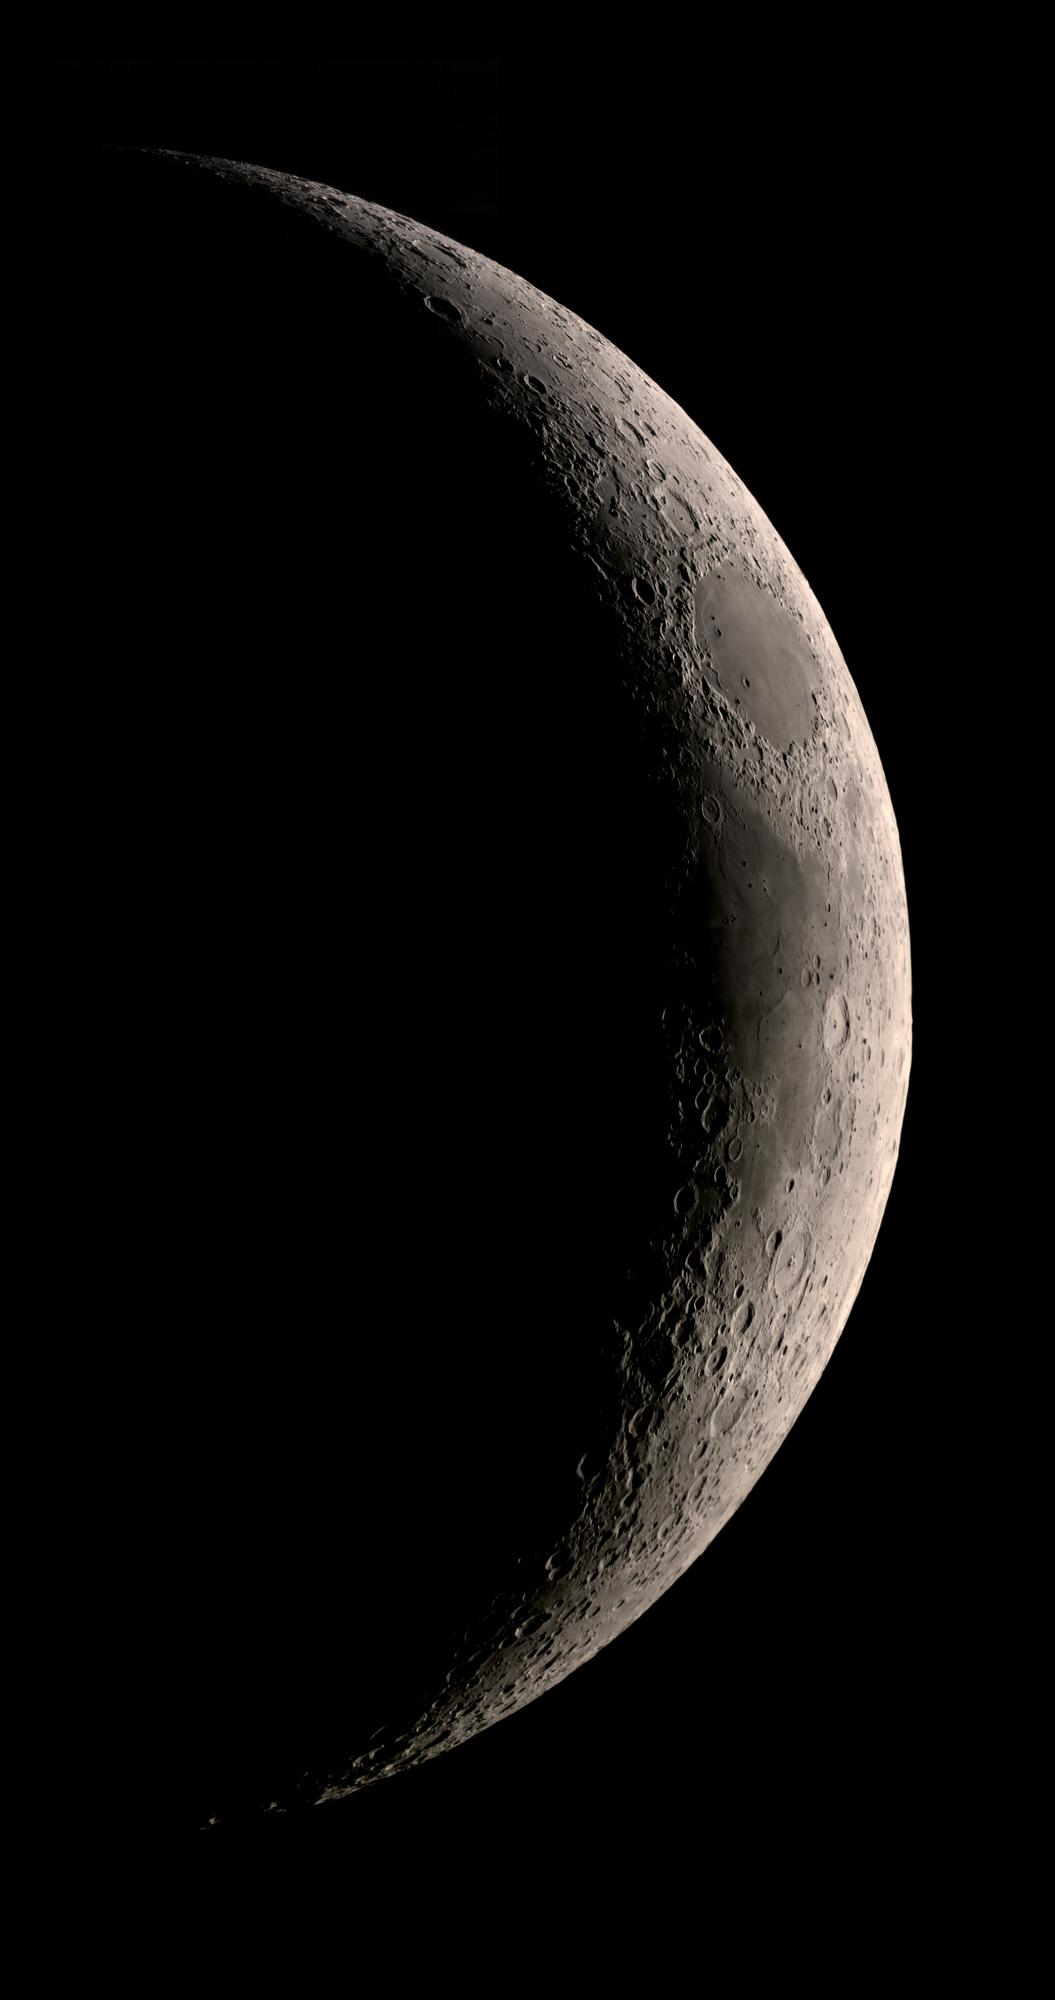 5ef4fc9ce71d1_lune240620(C8-foyer-70).thumb.jpg.78caf47adc5ed391acd3f736c8e7fe66.jpg